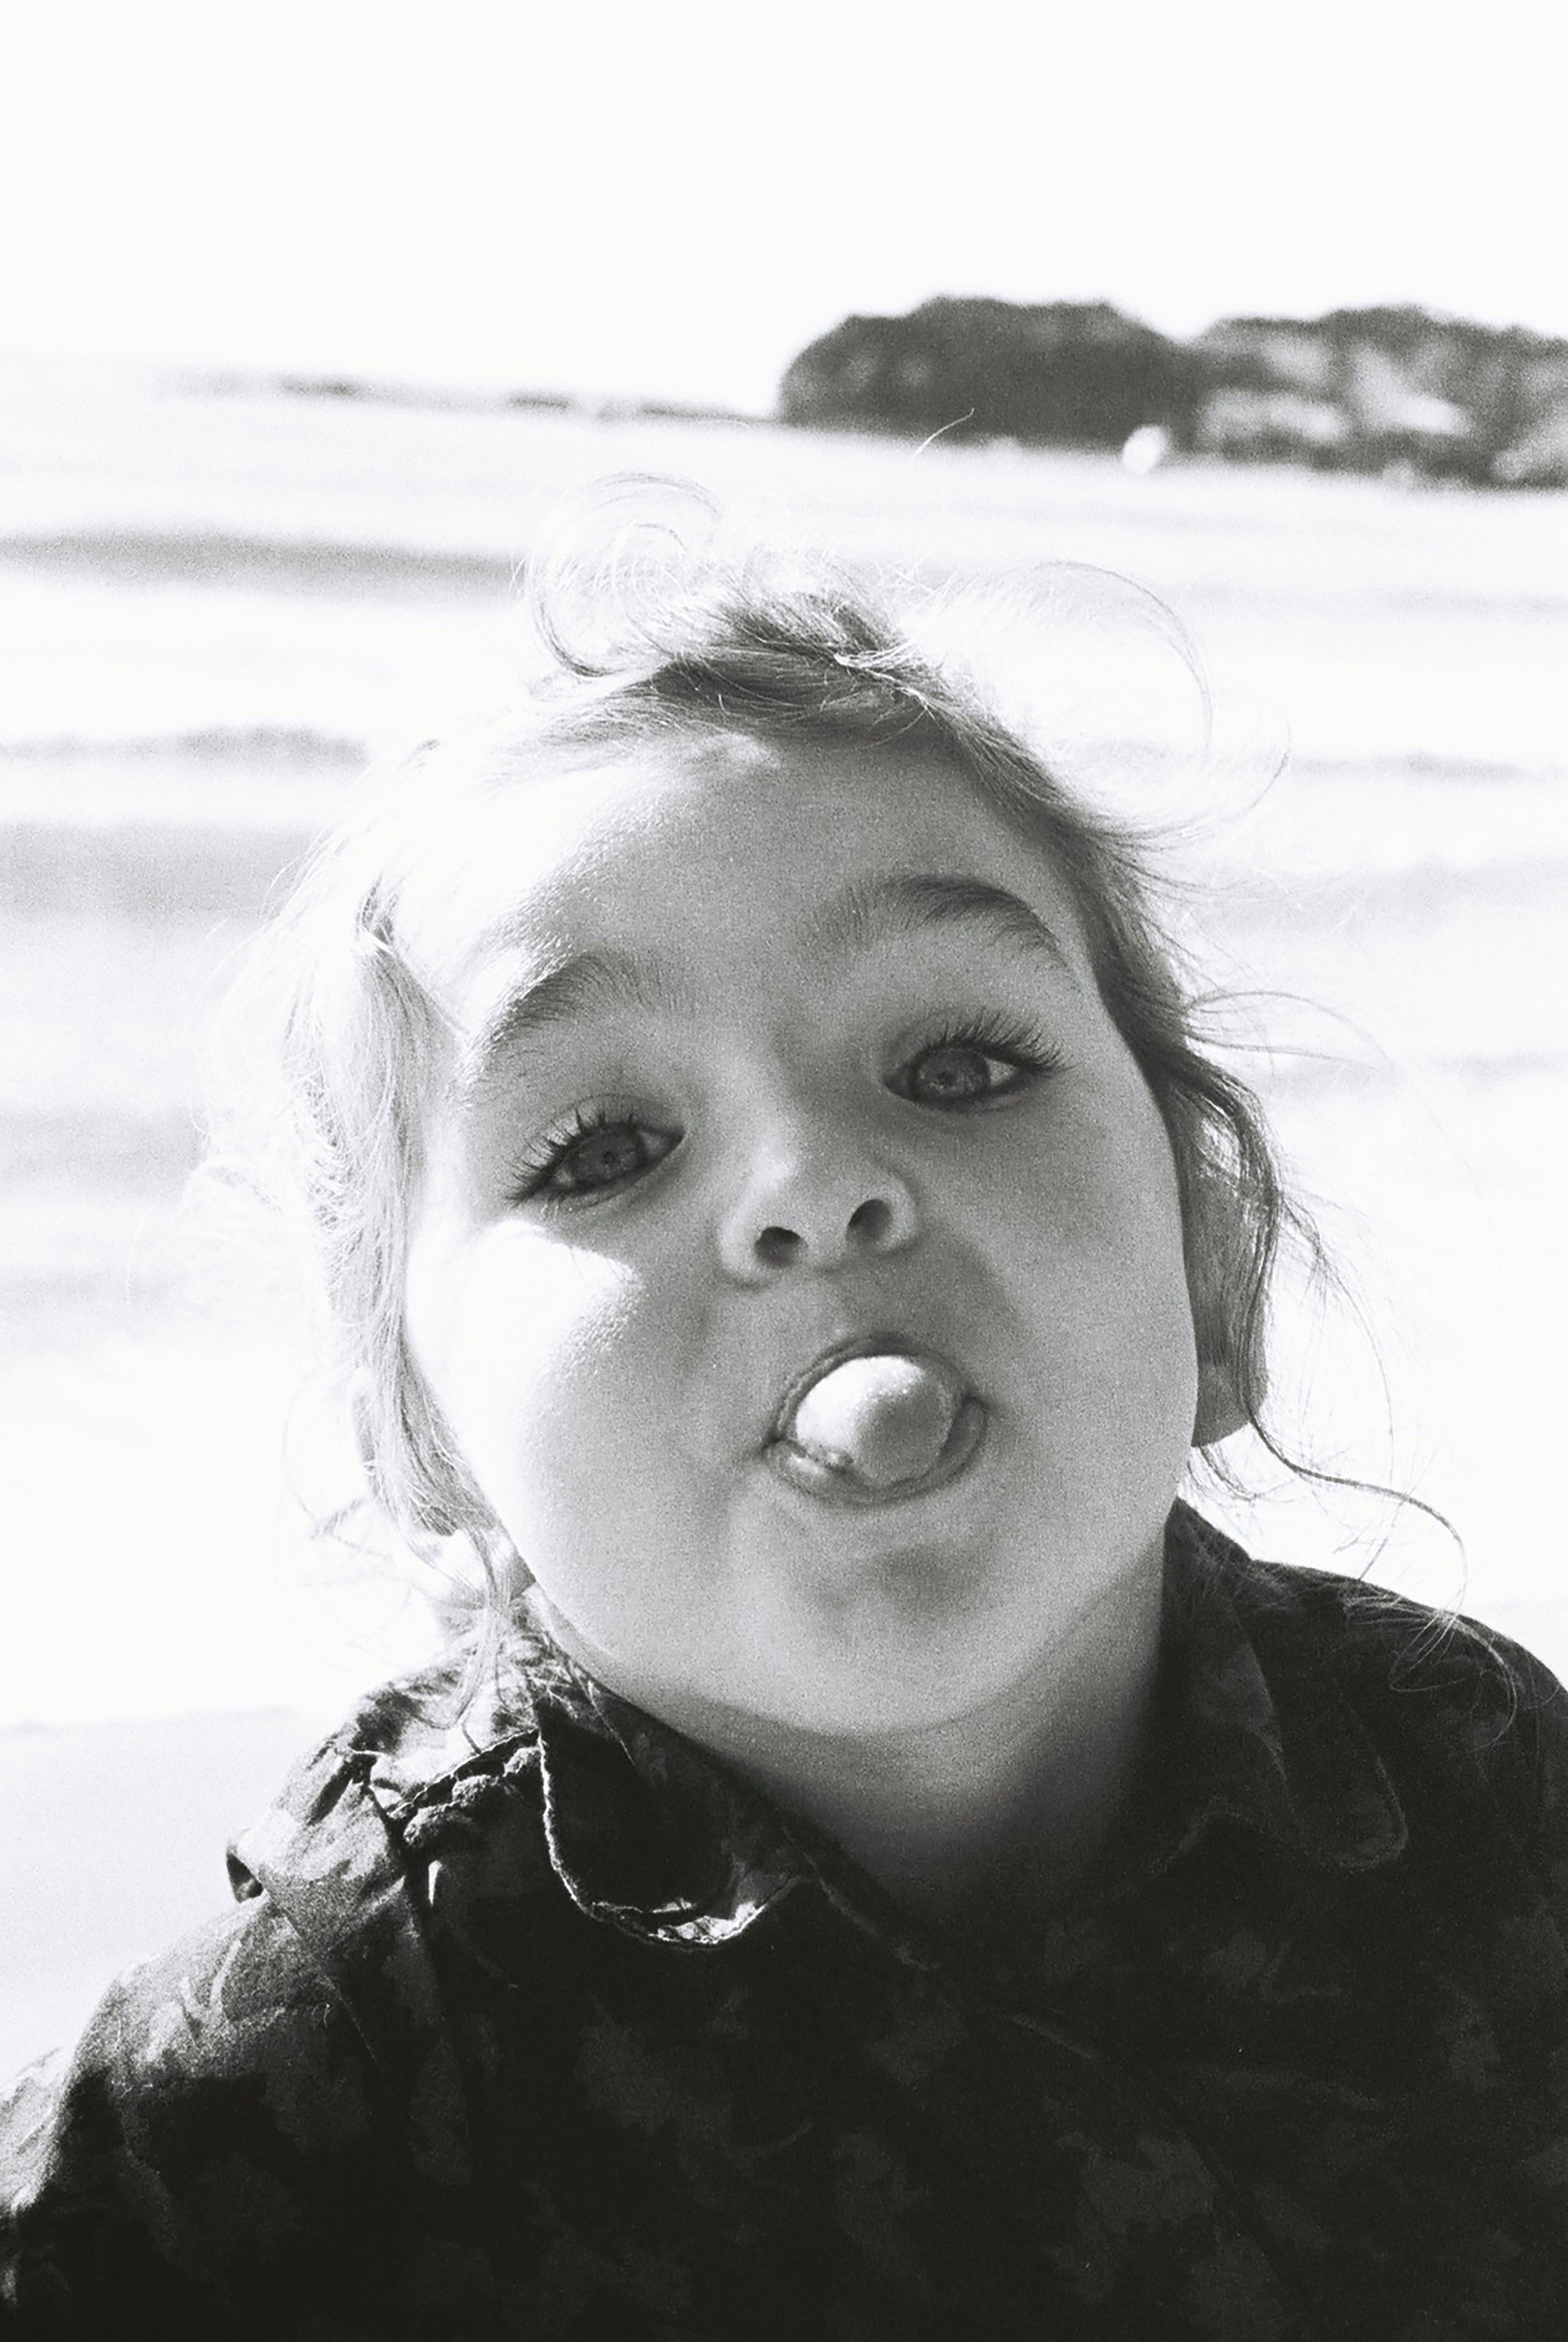 grayscale photography of girl